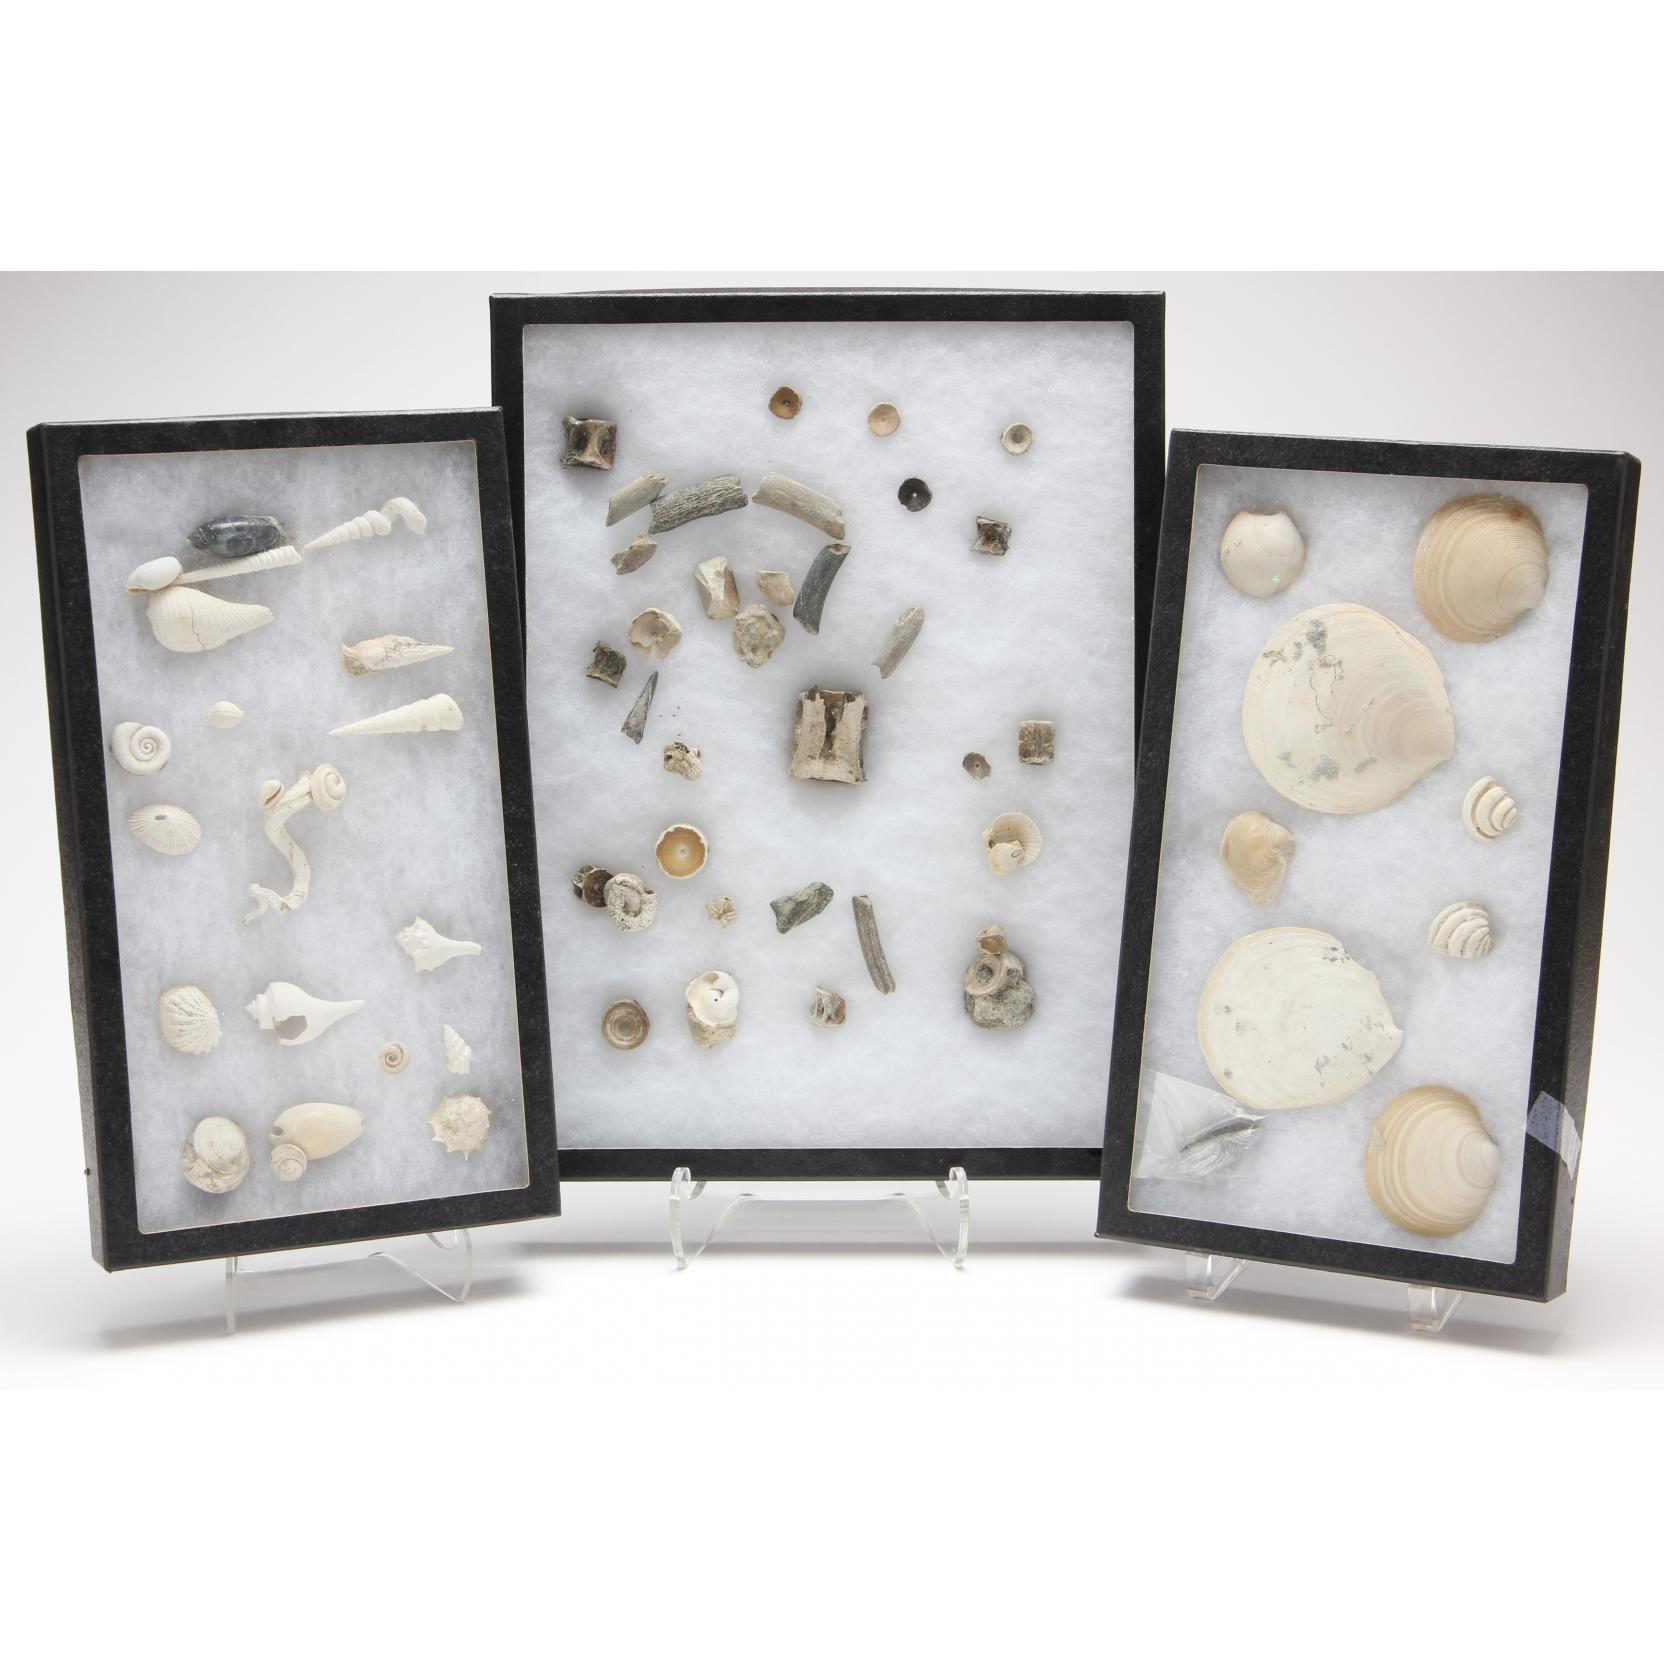 three-large-riker-mounts-of-marine-fossils